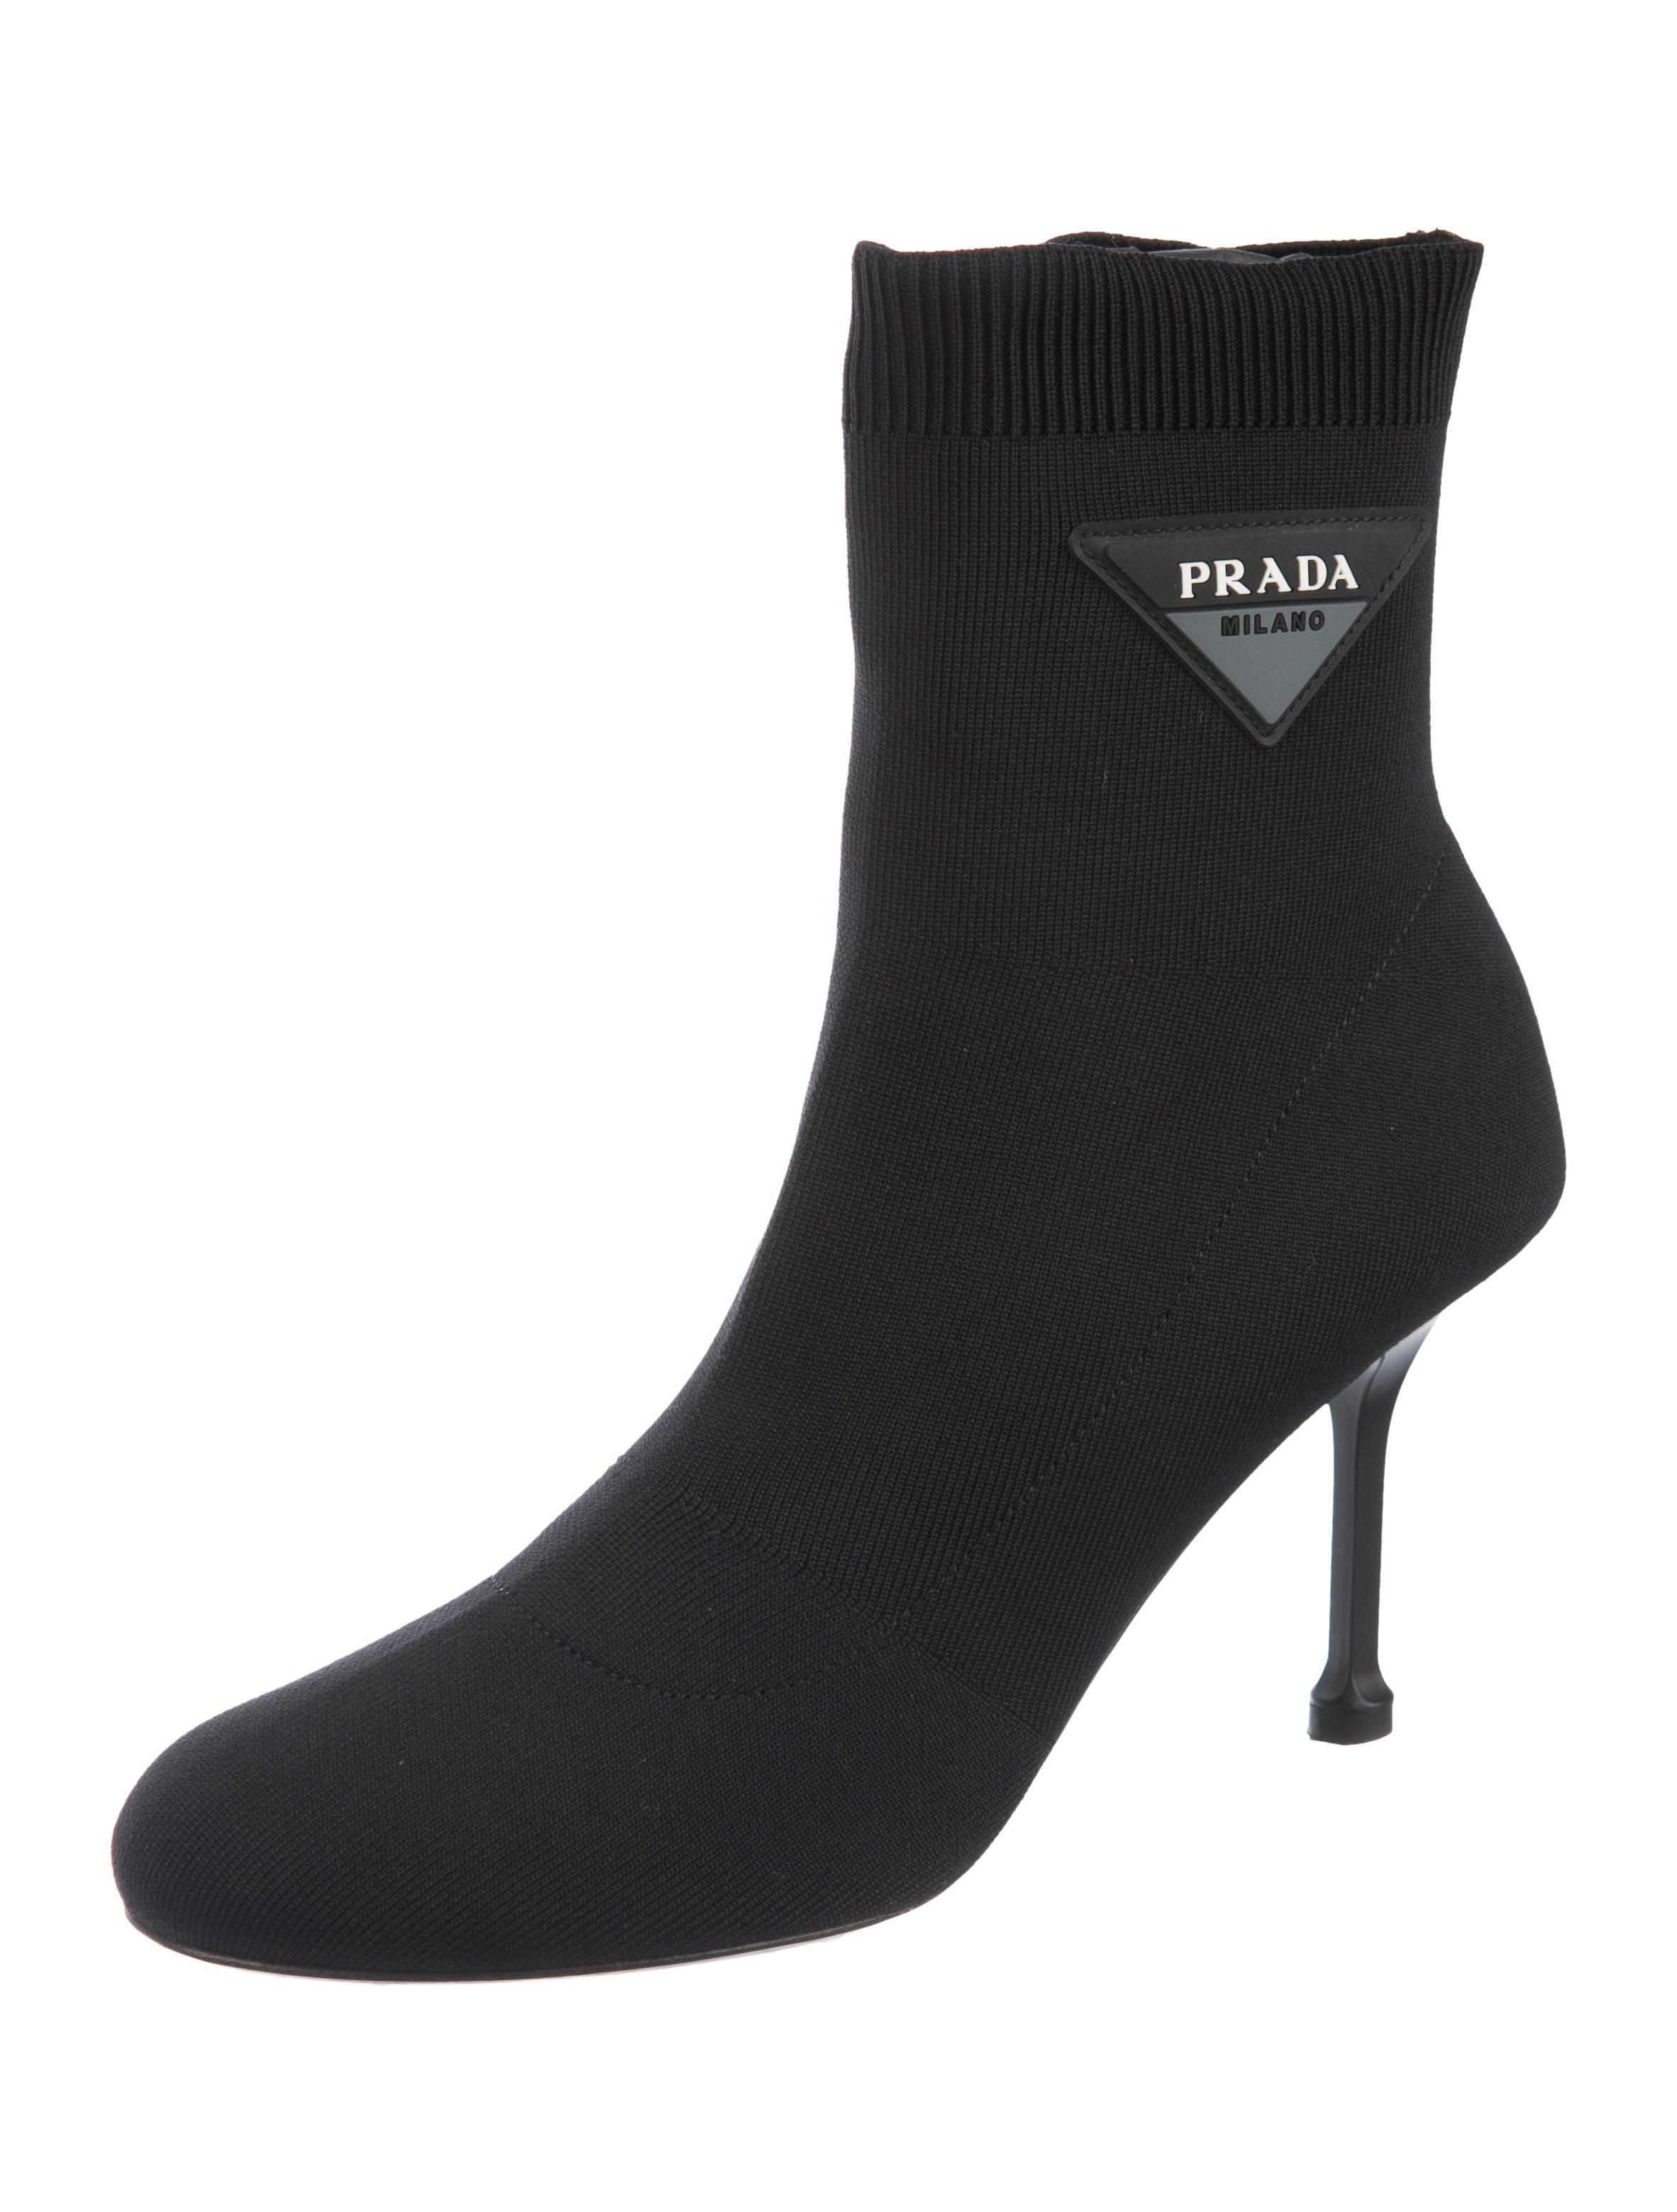 Prada Knit Sock Booties - Shoes